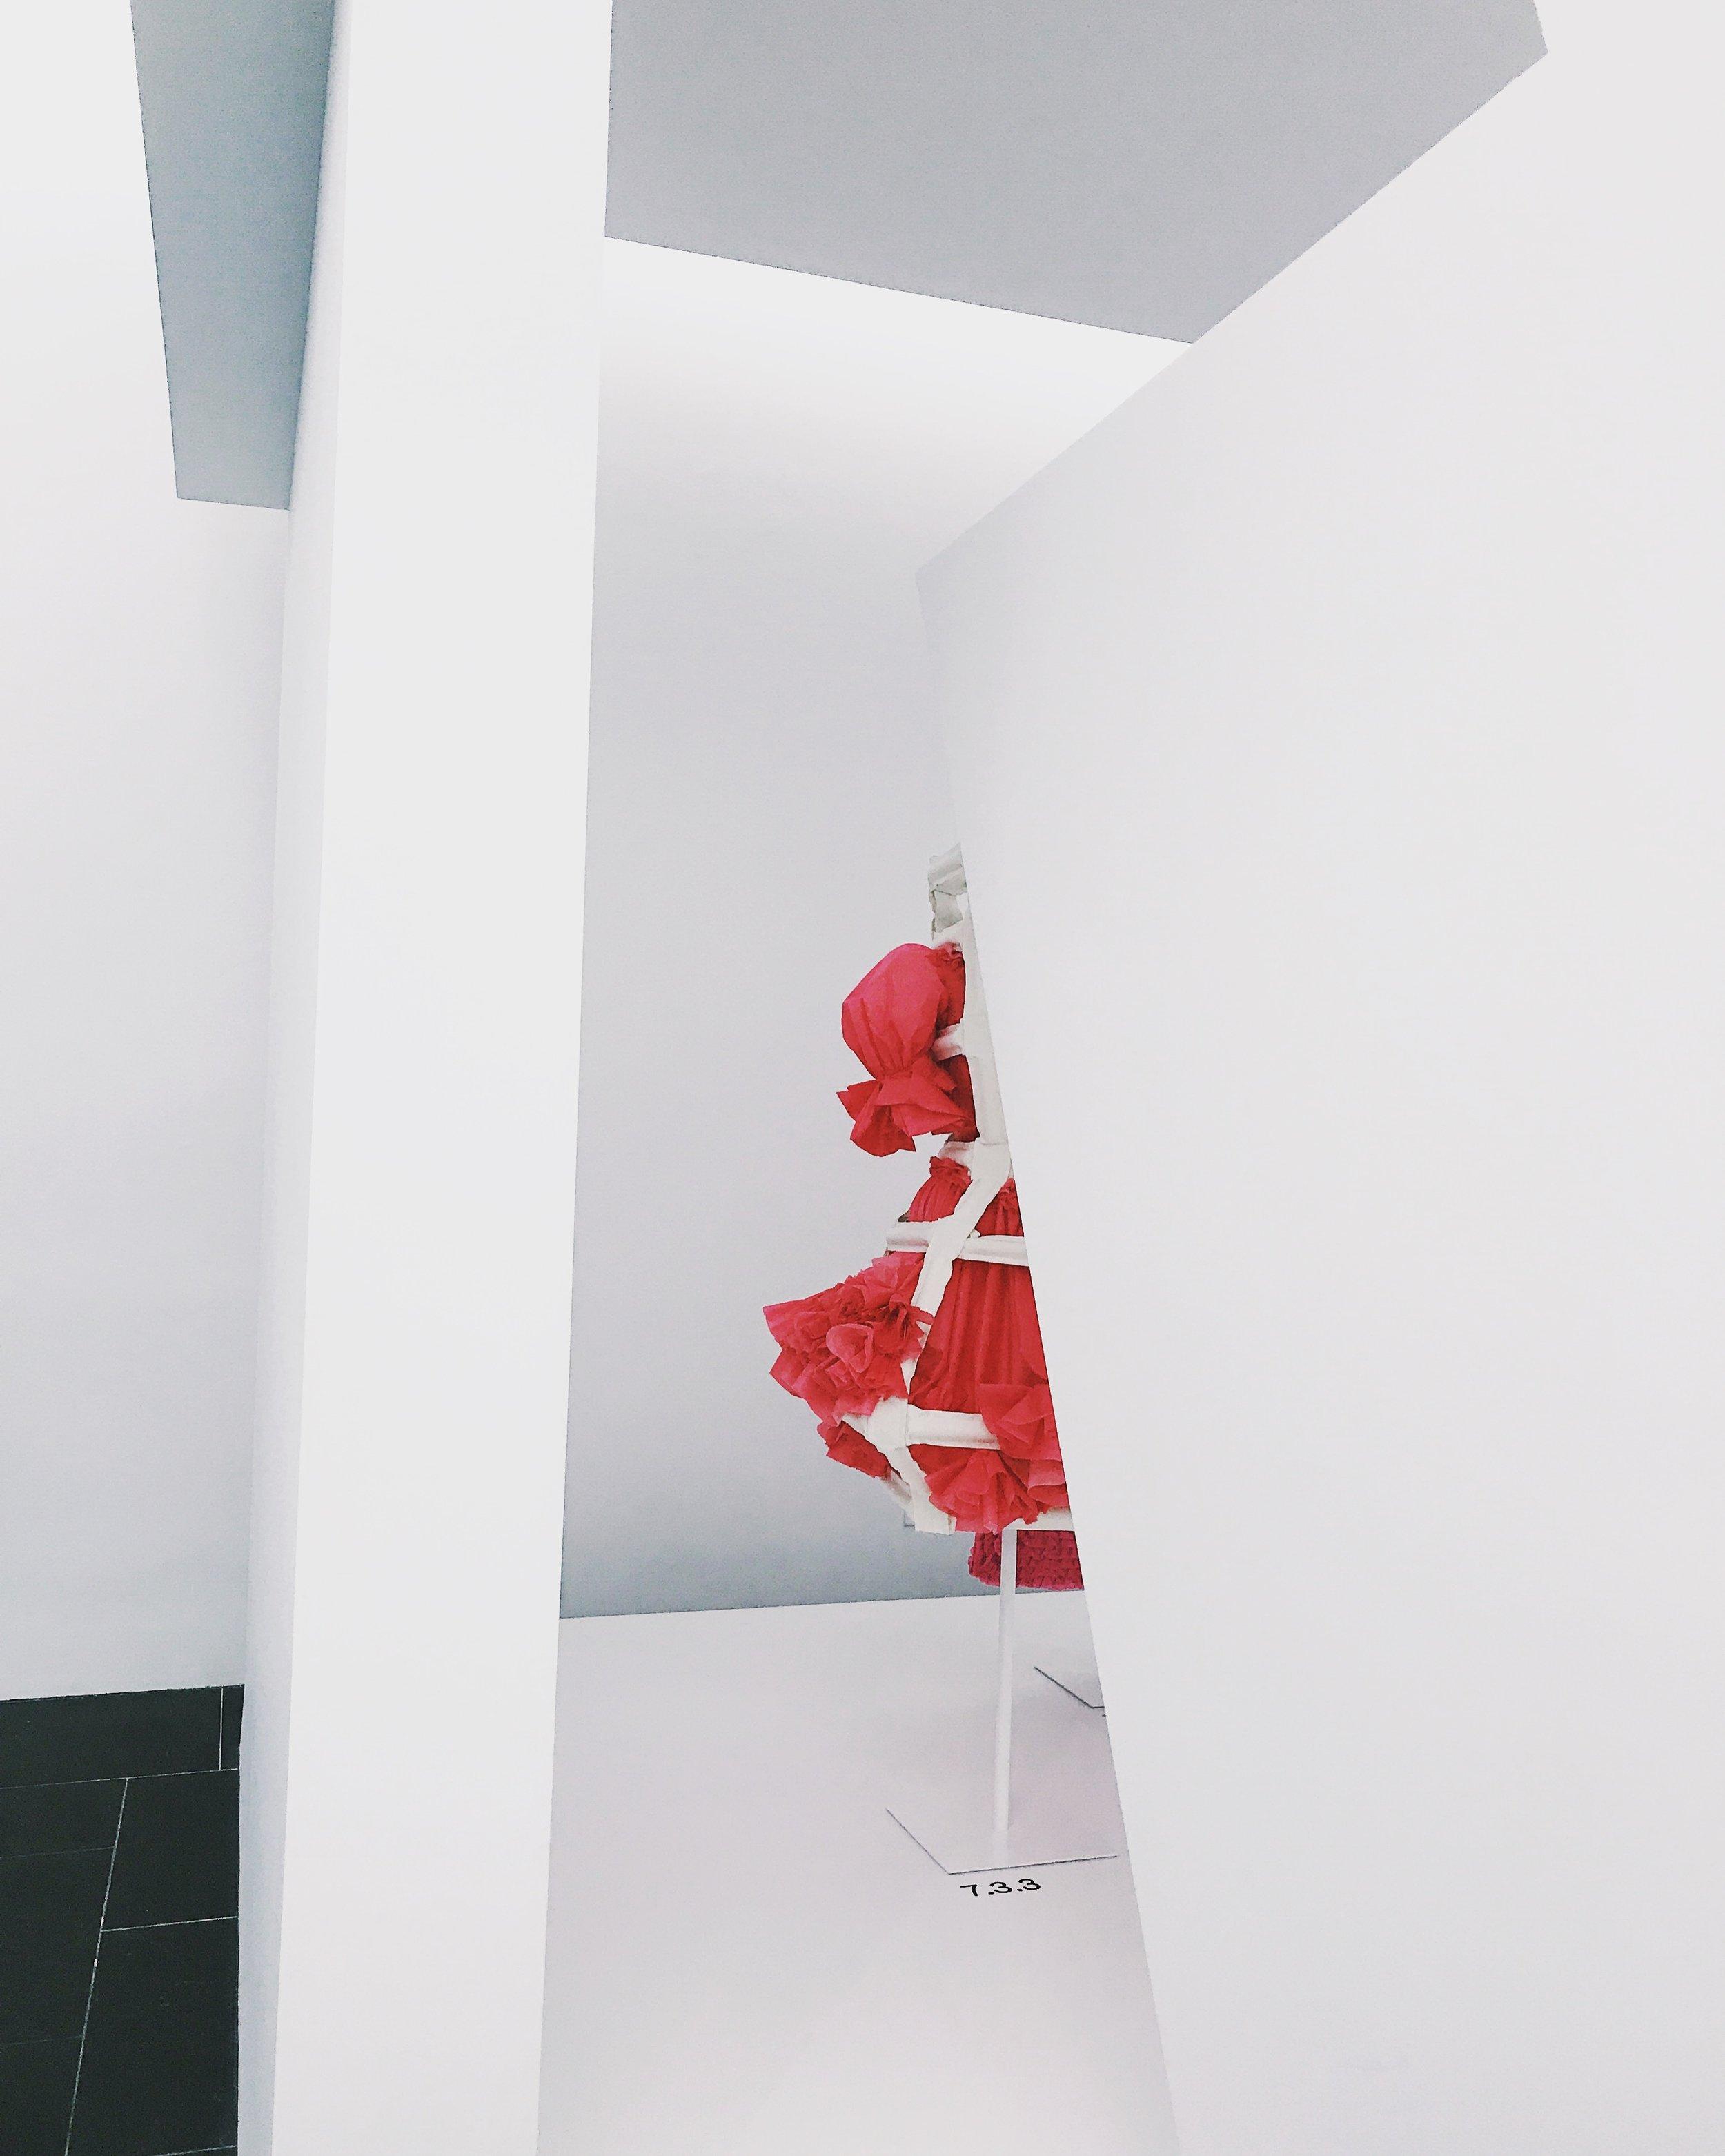 Comme des Garçons at the Met.